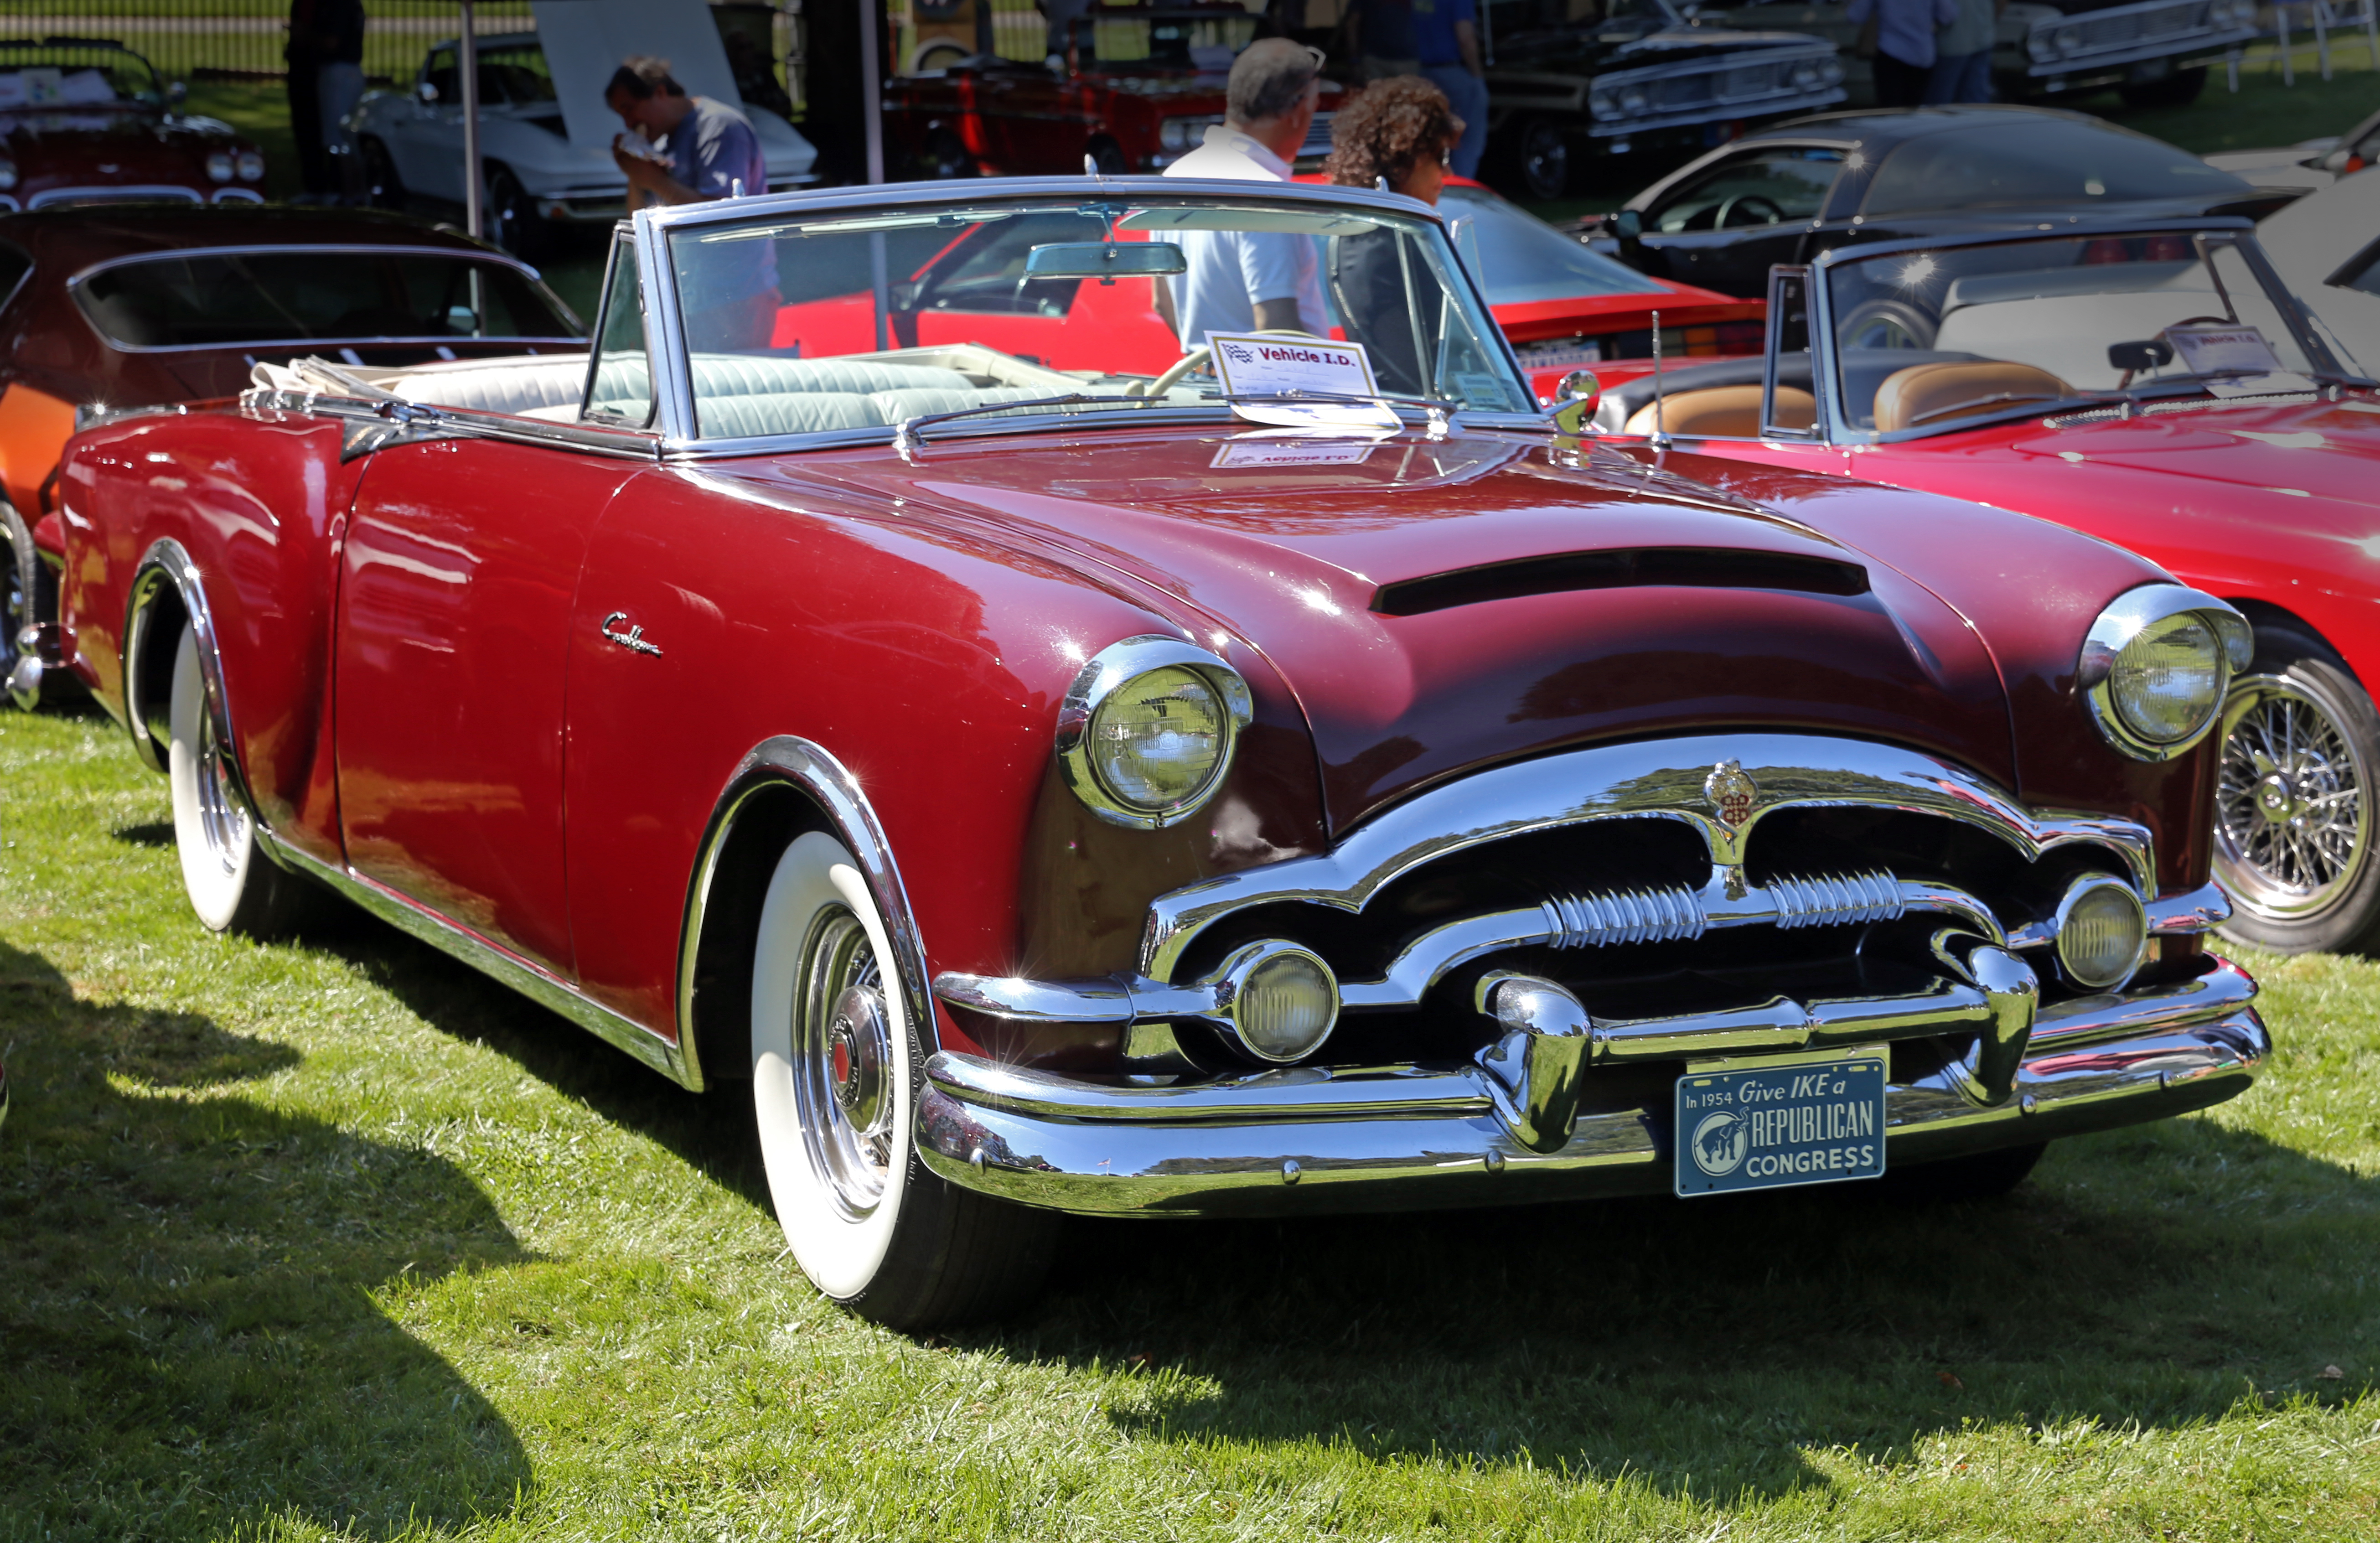 File:1953 Packard Caribbean convertible, Water Mill.jpg ...